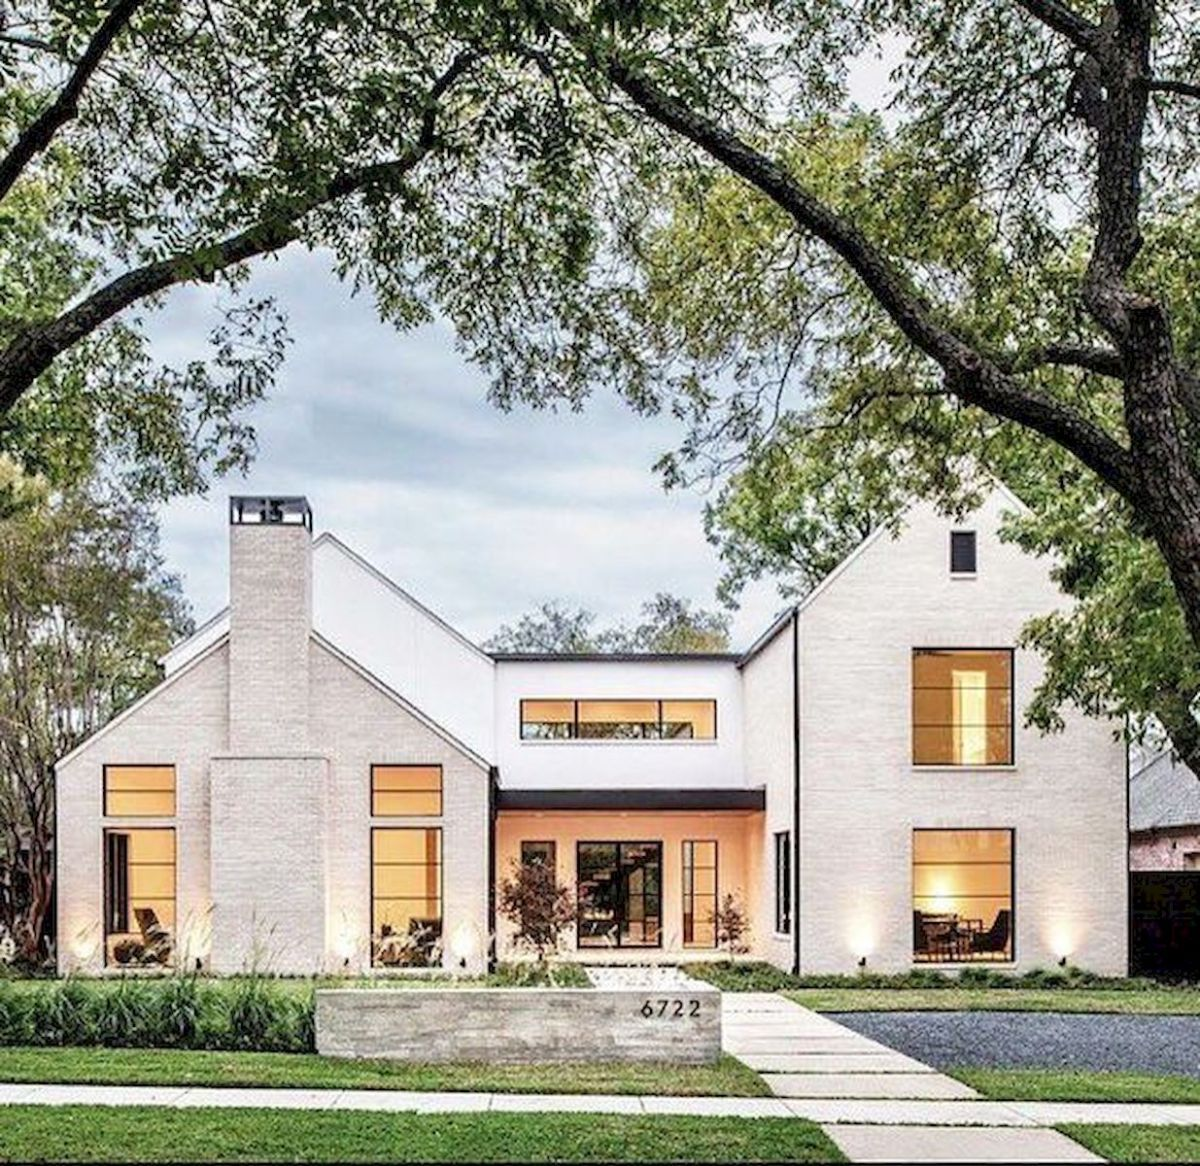 33 beautiful modern farmhouse exterior design ideas 1 in - Rustic modern farmhouse exterior ...